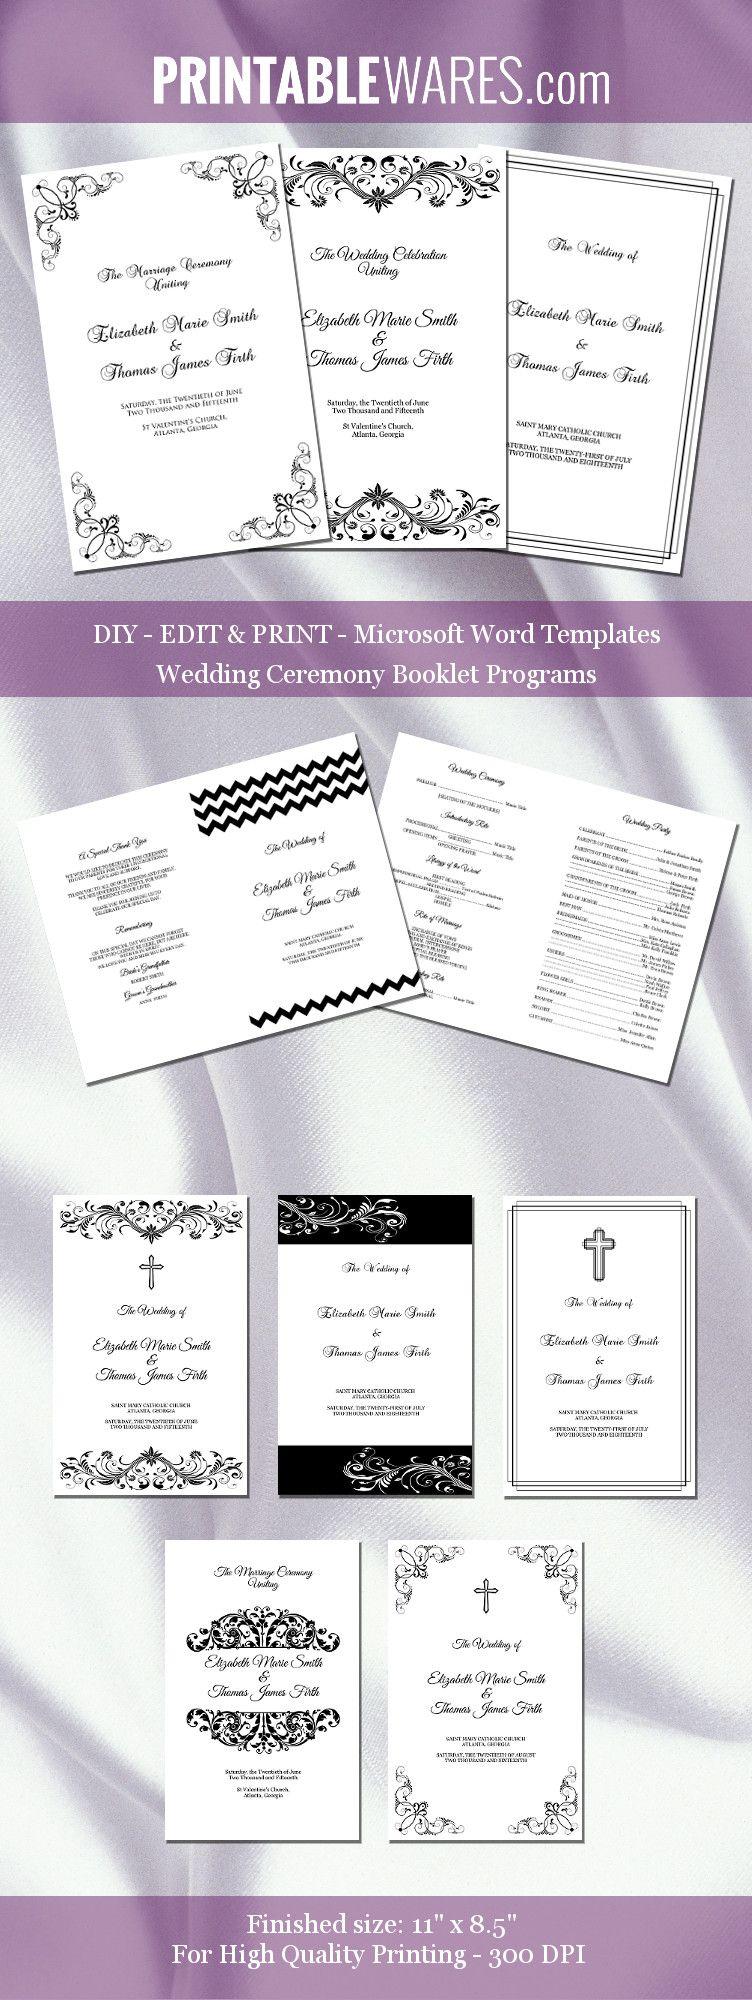 Booklet Wedding Program Templates Word Black White Ceremony Program Template Diy Wedding Programs Wedding Ceremony Programs Template Microsoft word wedding program template